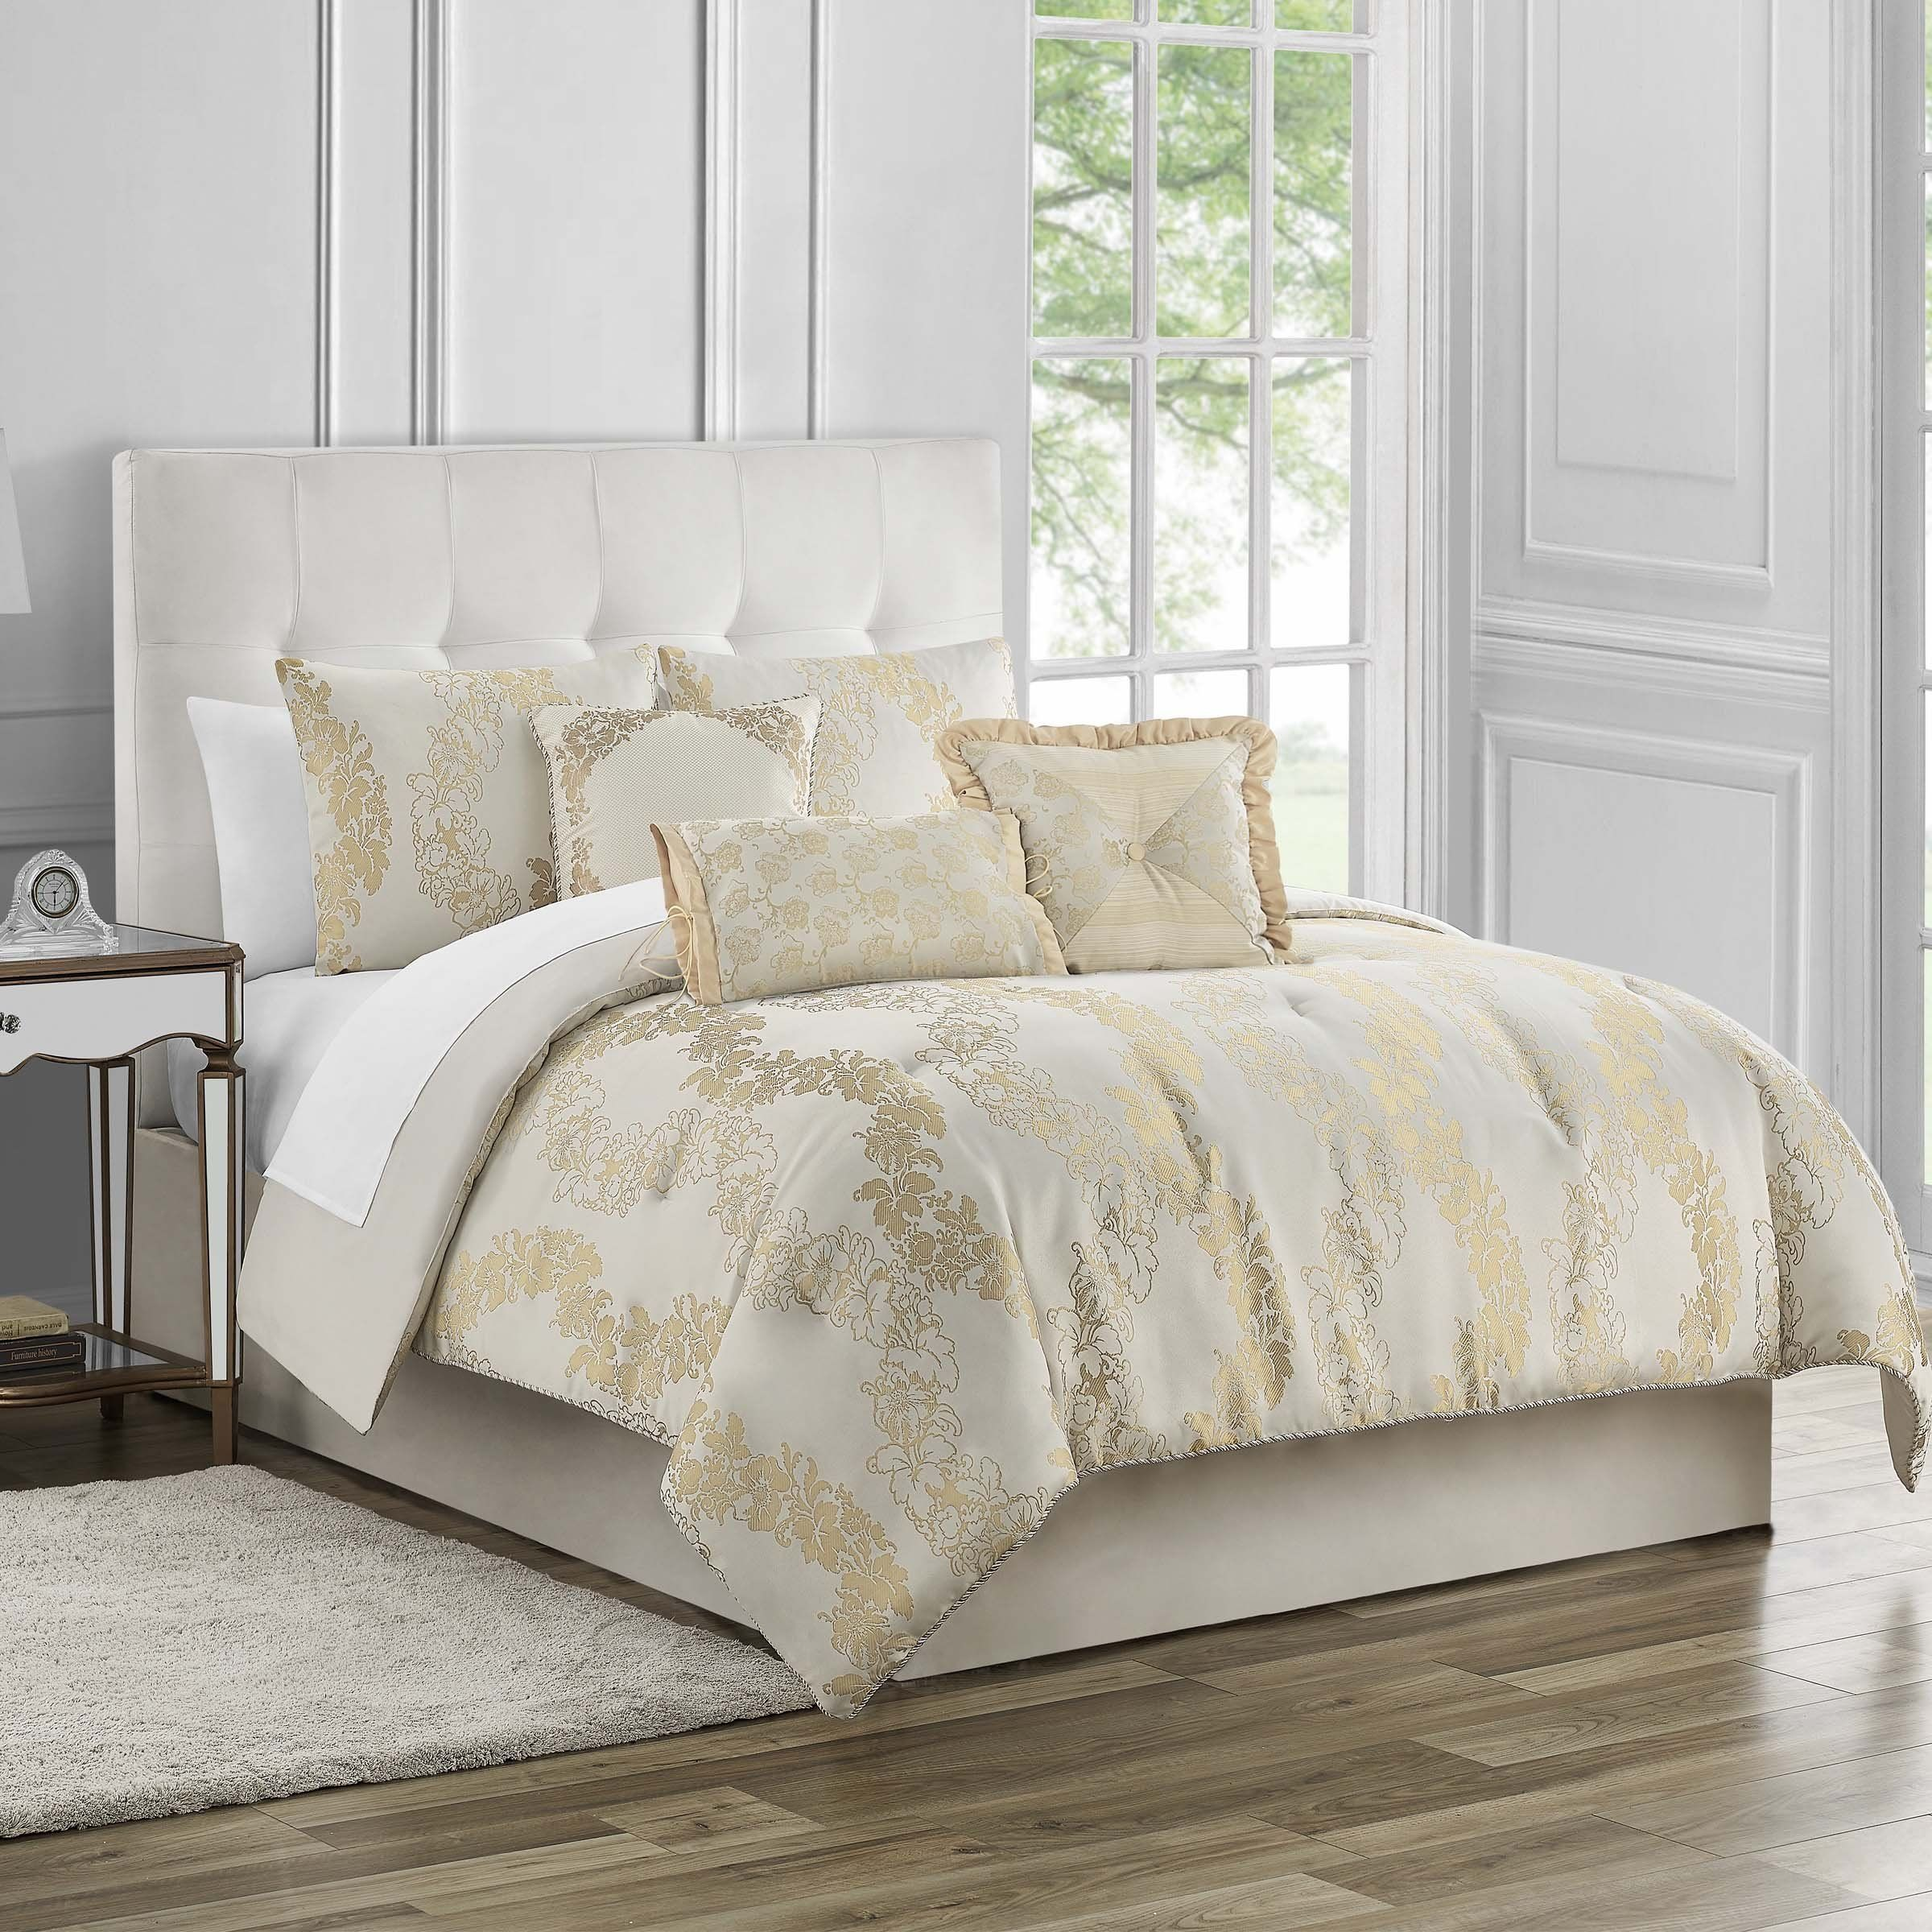 Oban Ivory 7 Piece Comforter Set In 2020 Comforter Sets Comforters King Comforter Sets